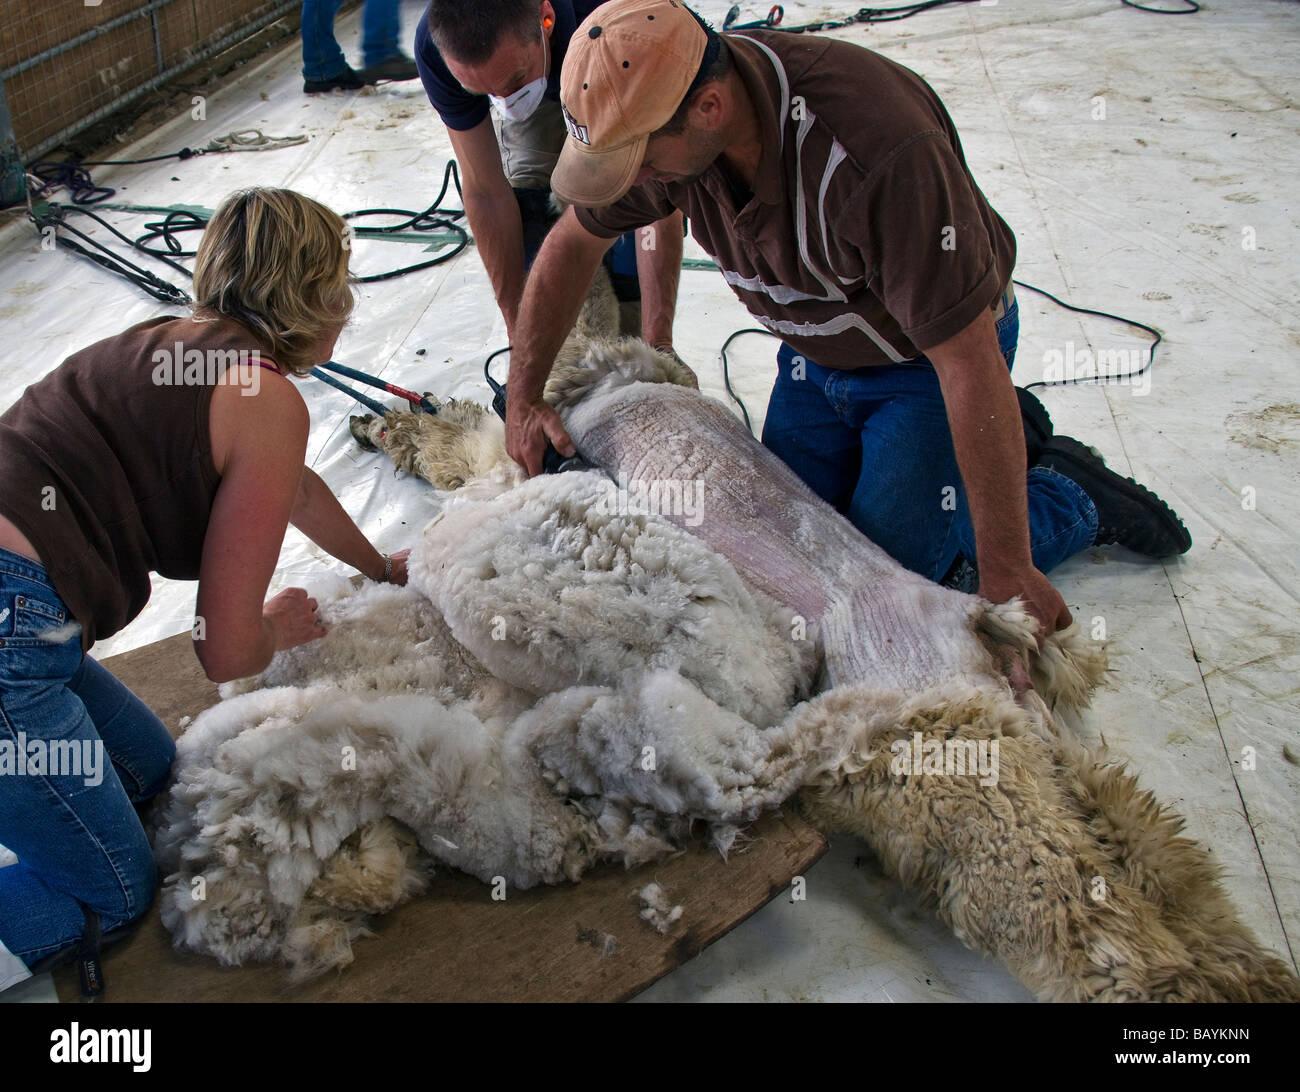 An Alpaca, Lama pacos,  being shorn of it's fleece. - Stock Image